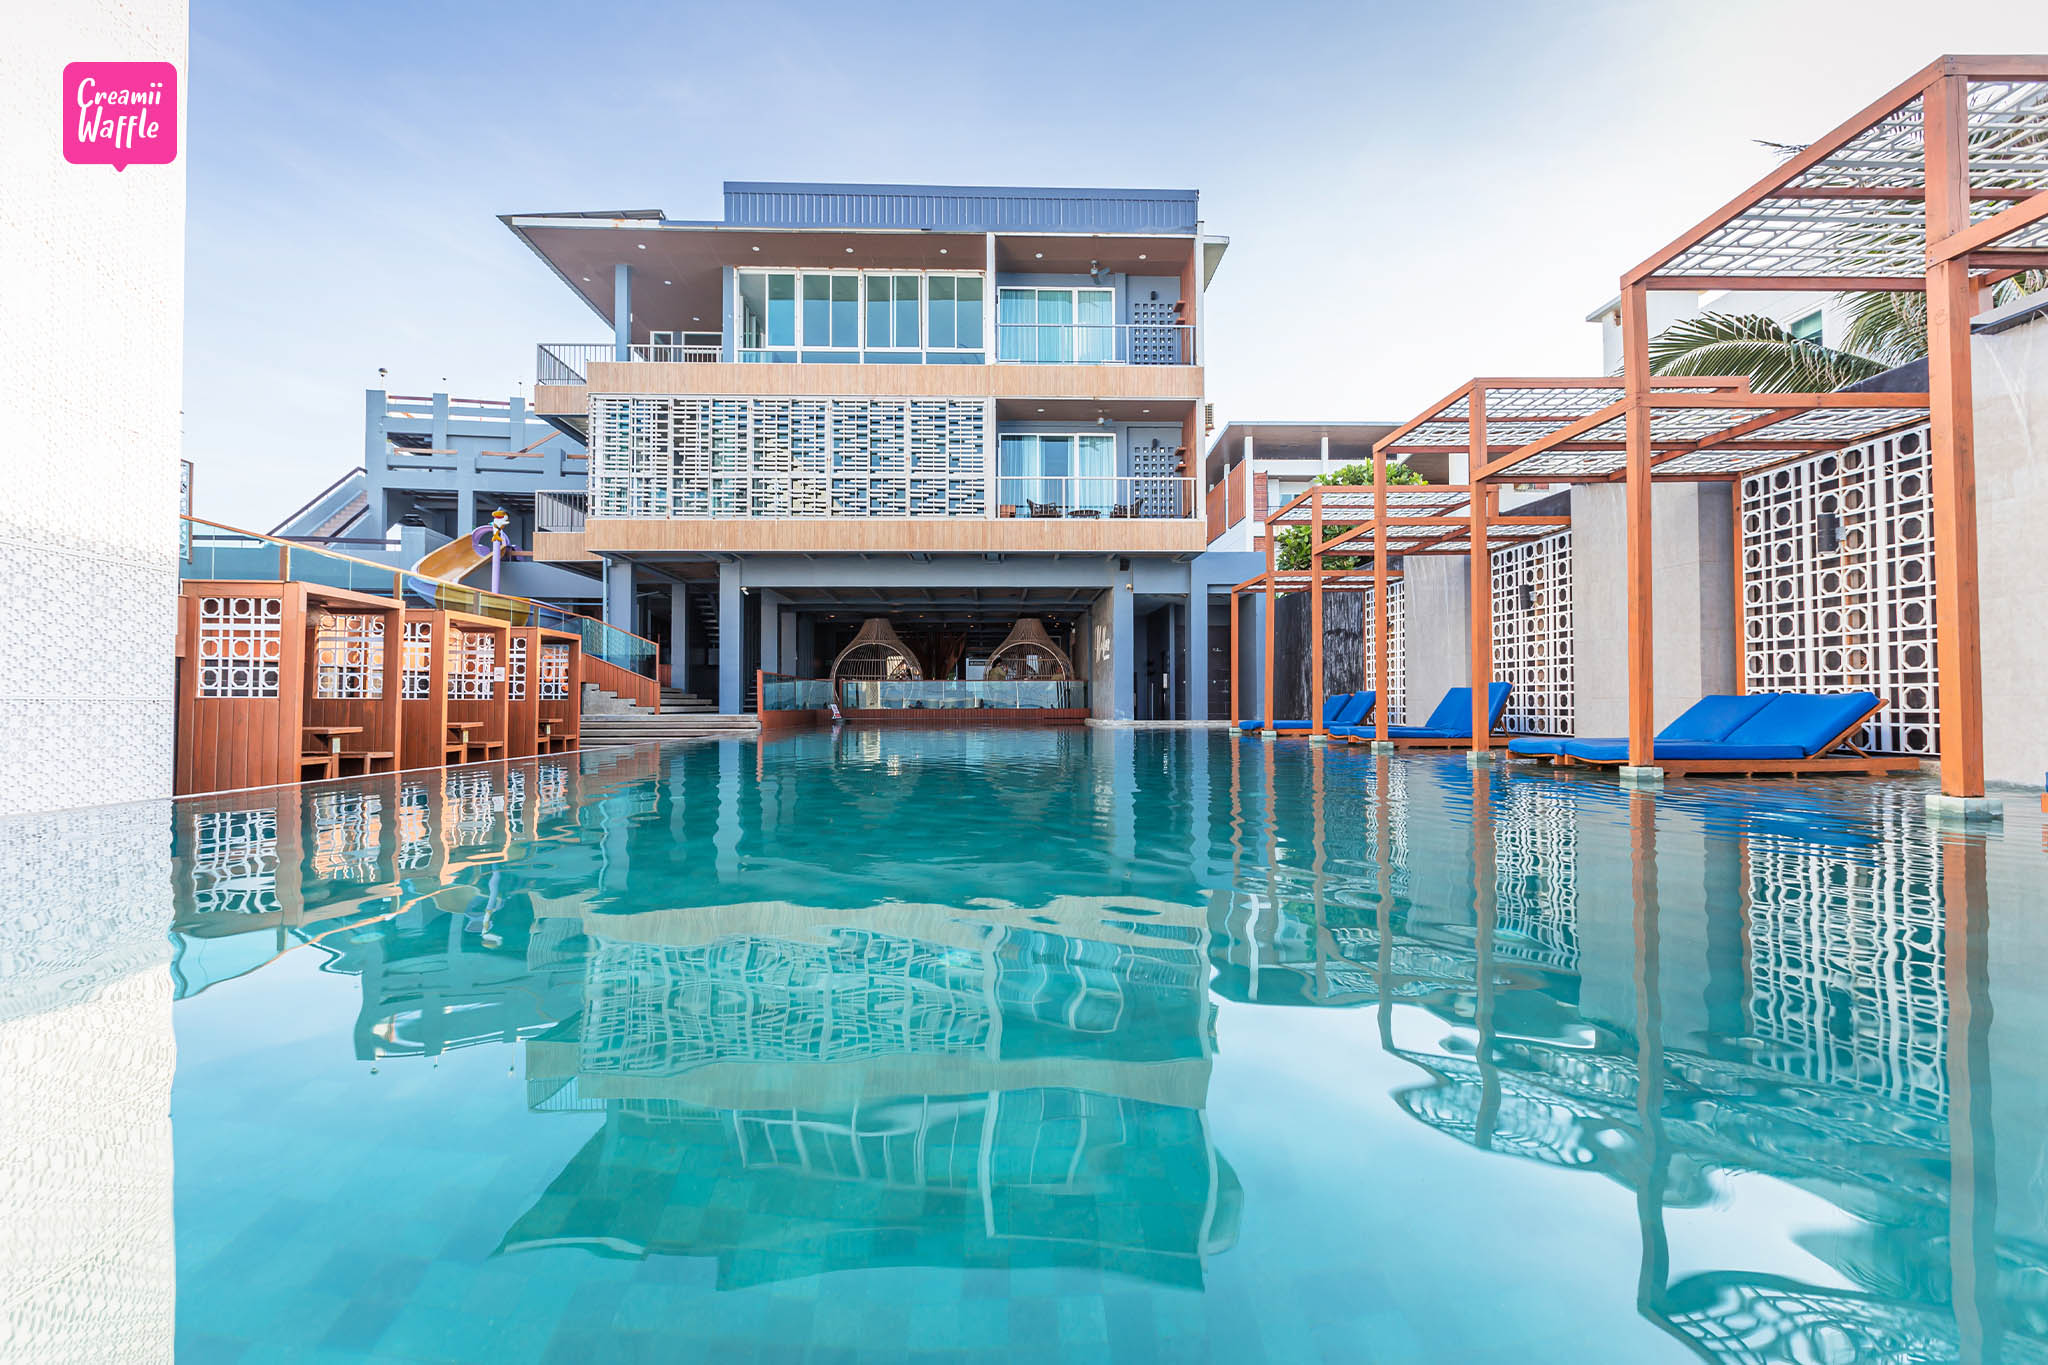 Maldives Beach Resort Chanthaburi มัลดีฟส์ บีช รีสอร์ท จันทบุรี ที่พัก